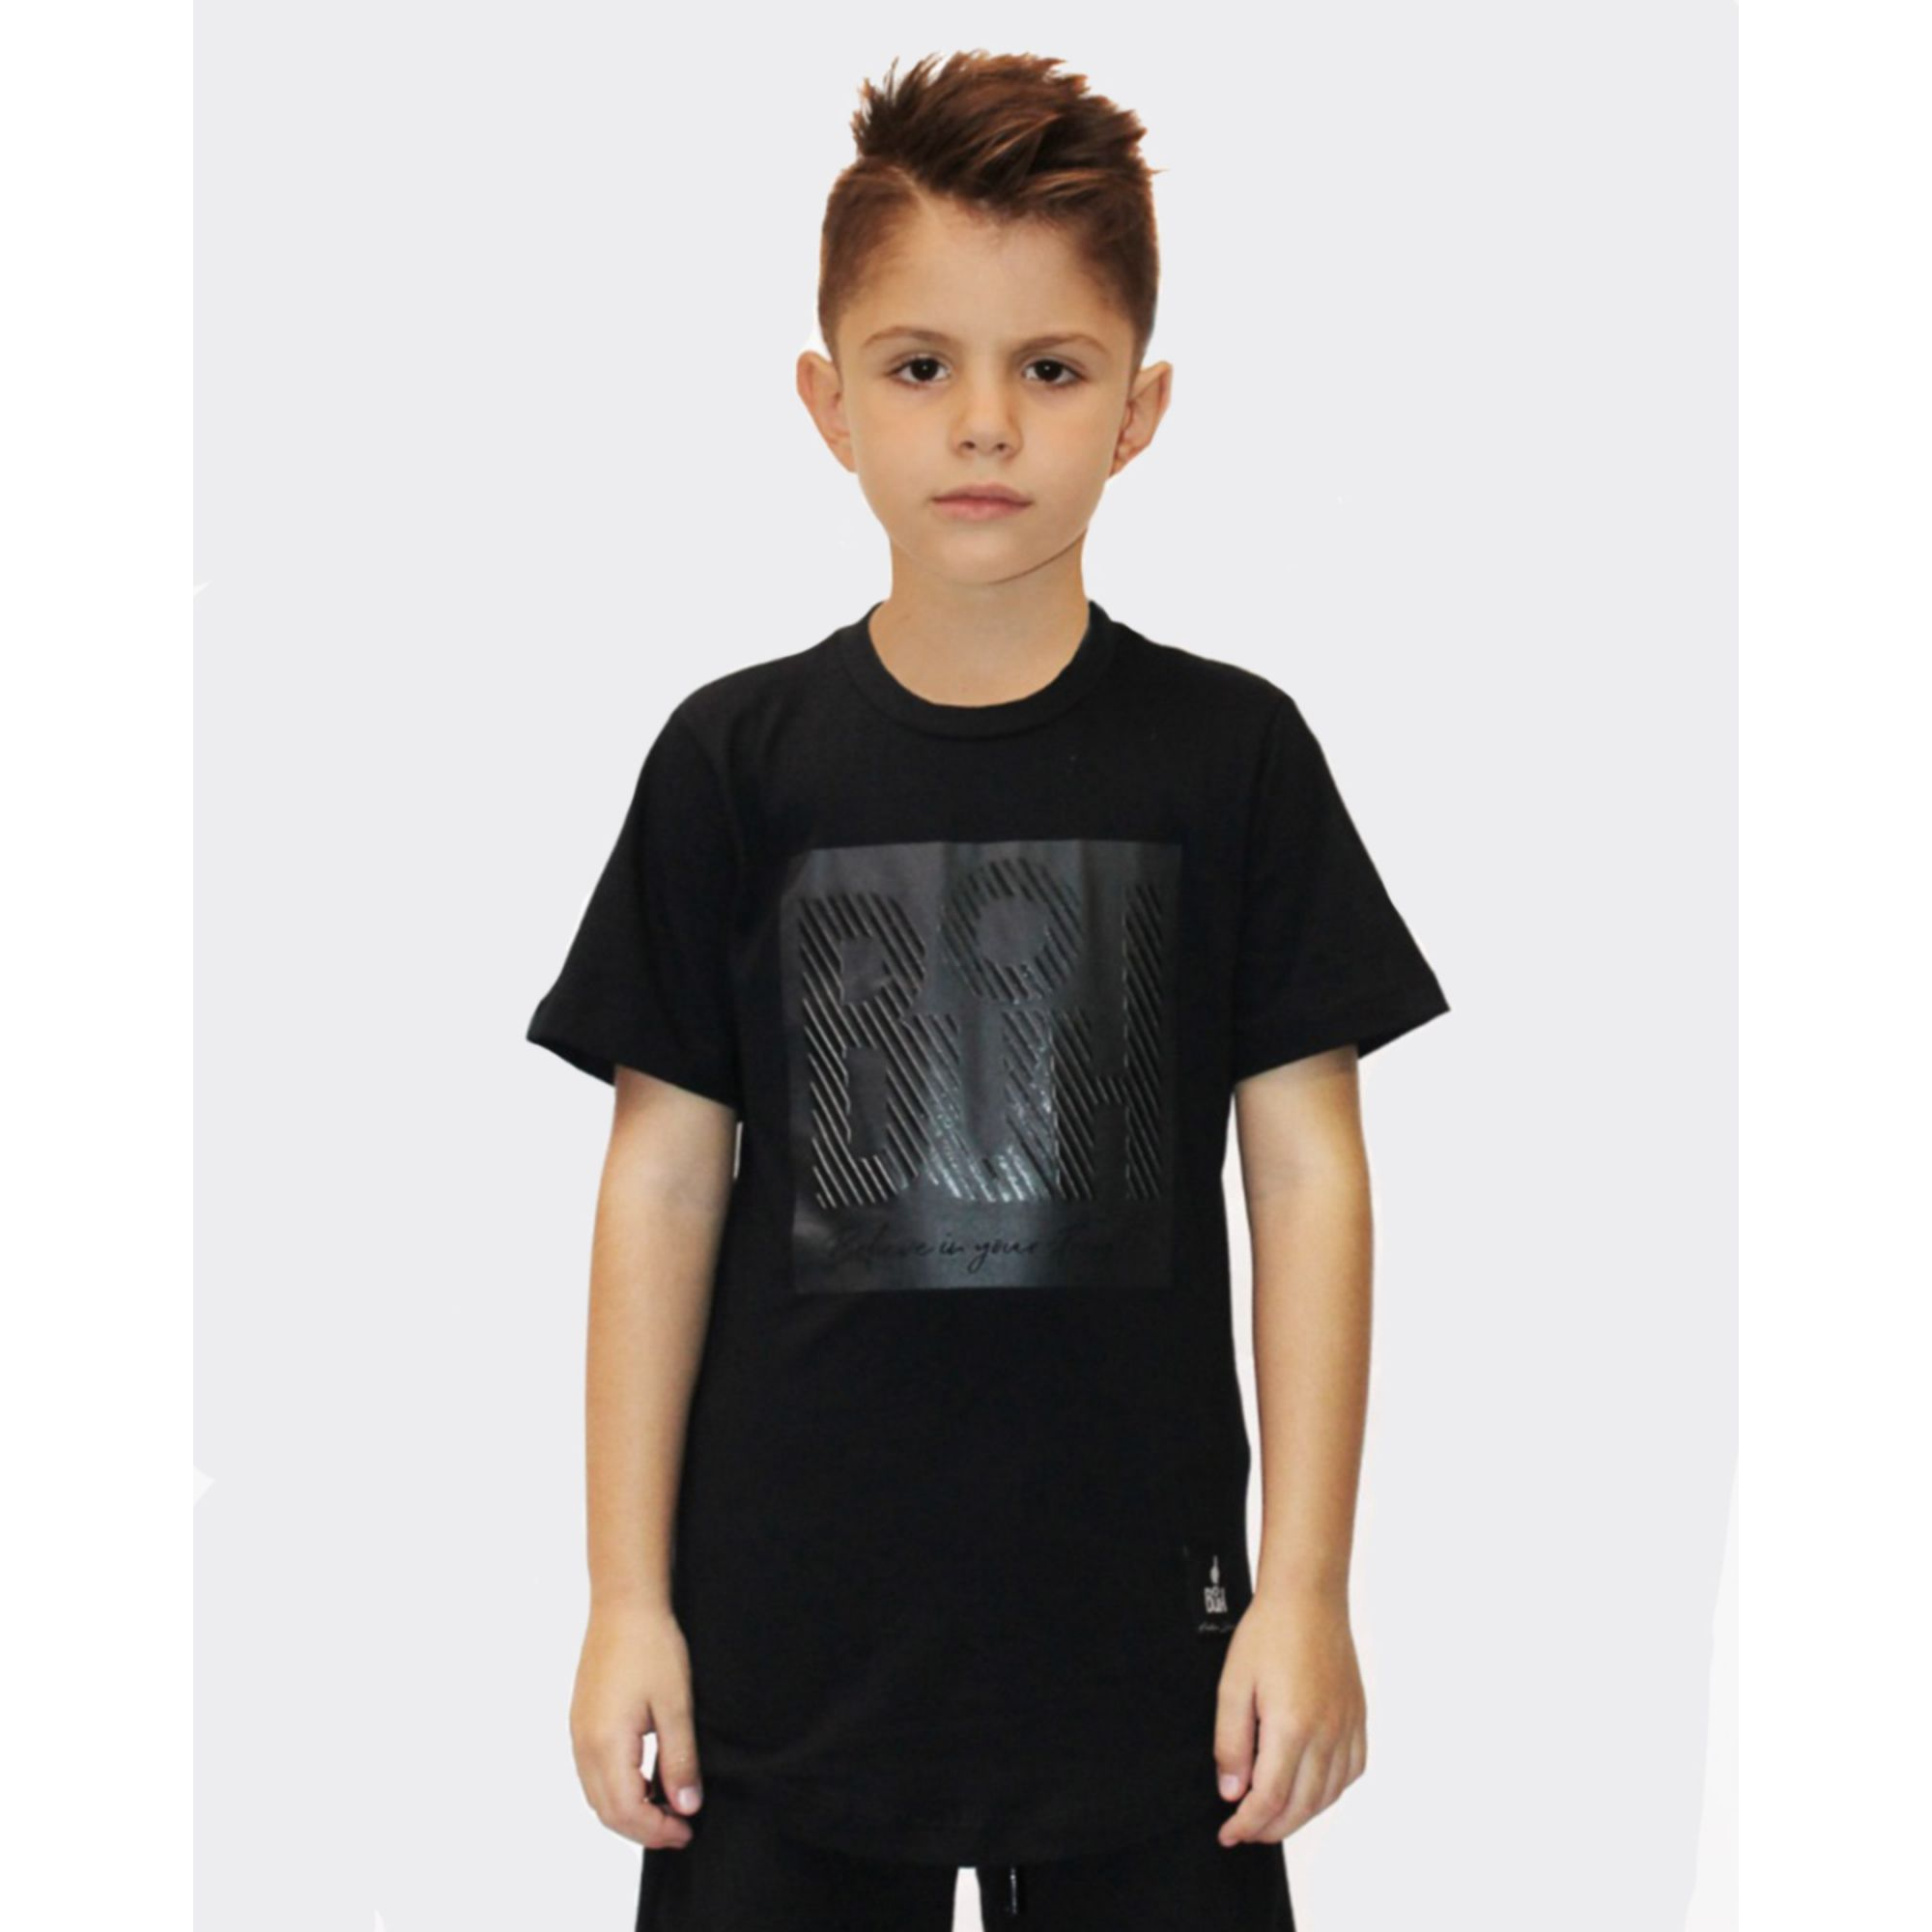 Camiseta Buh Kids Square Believe All Black